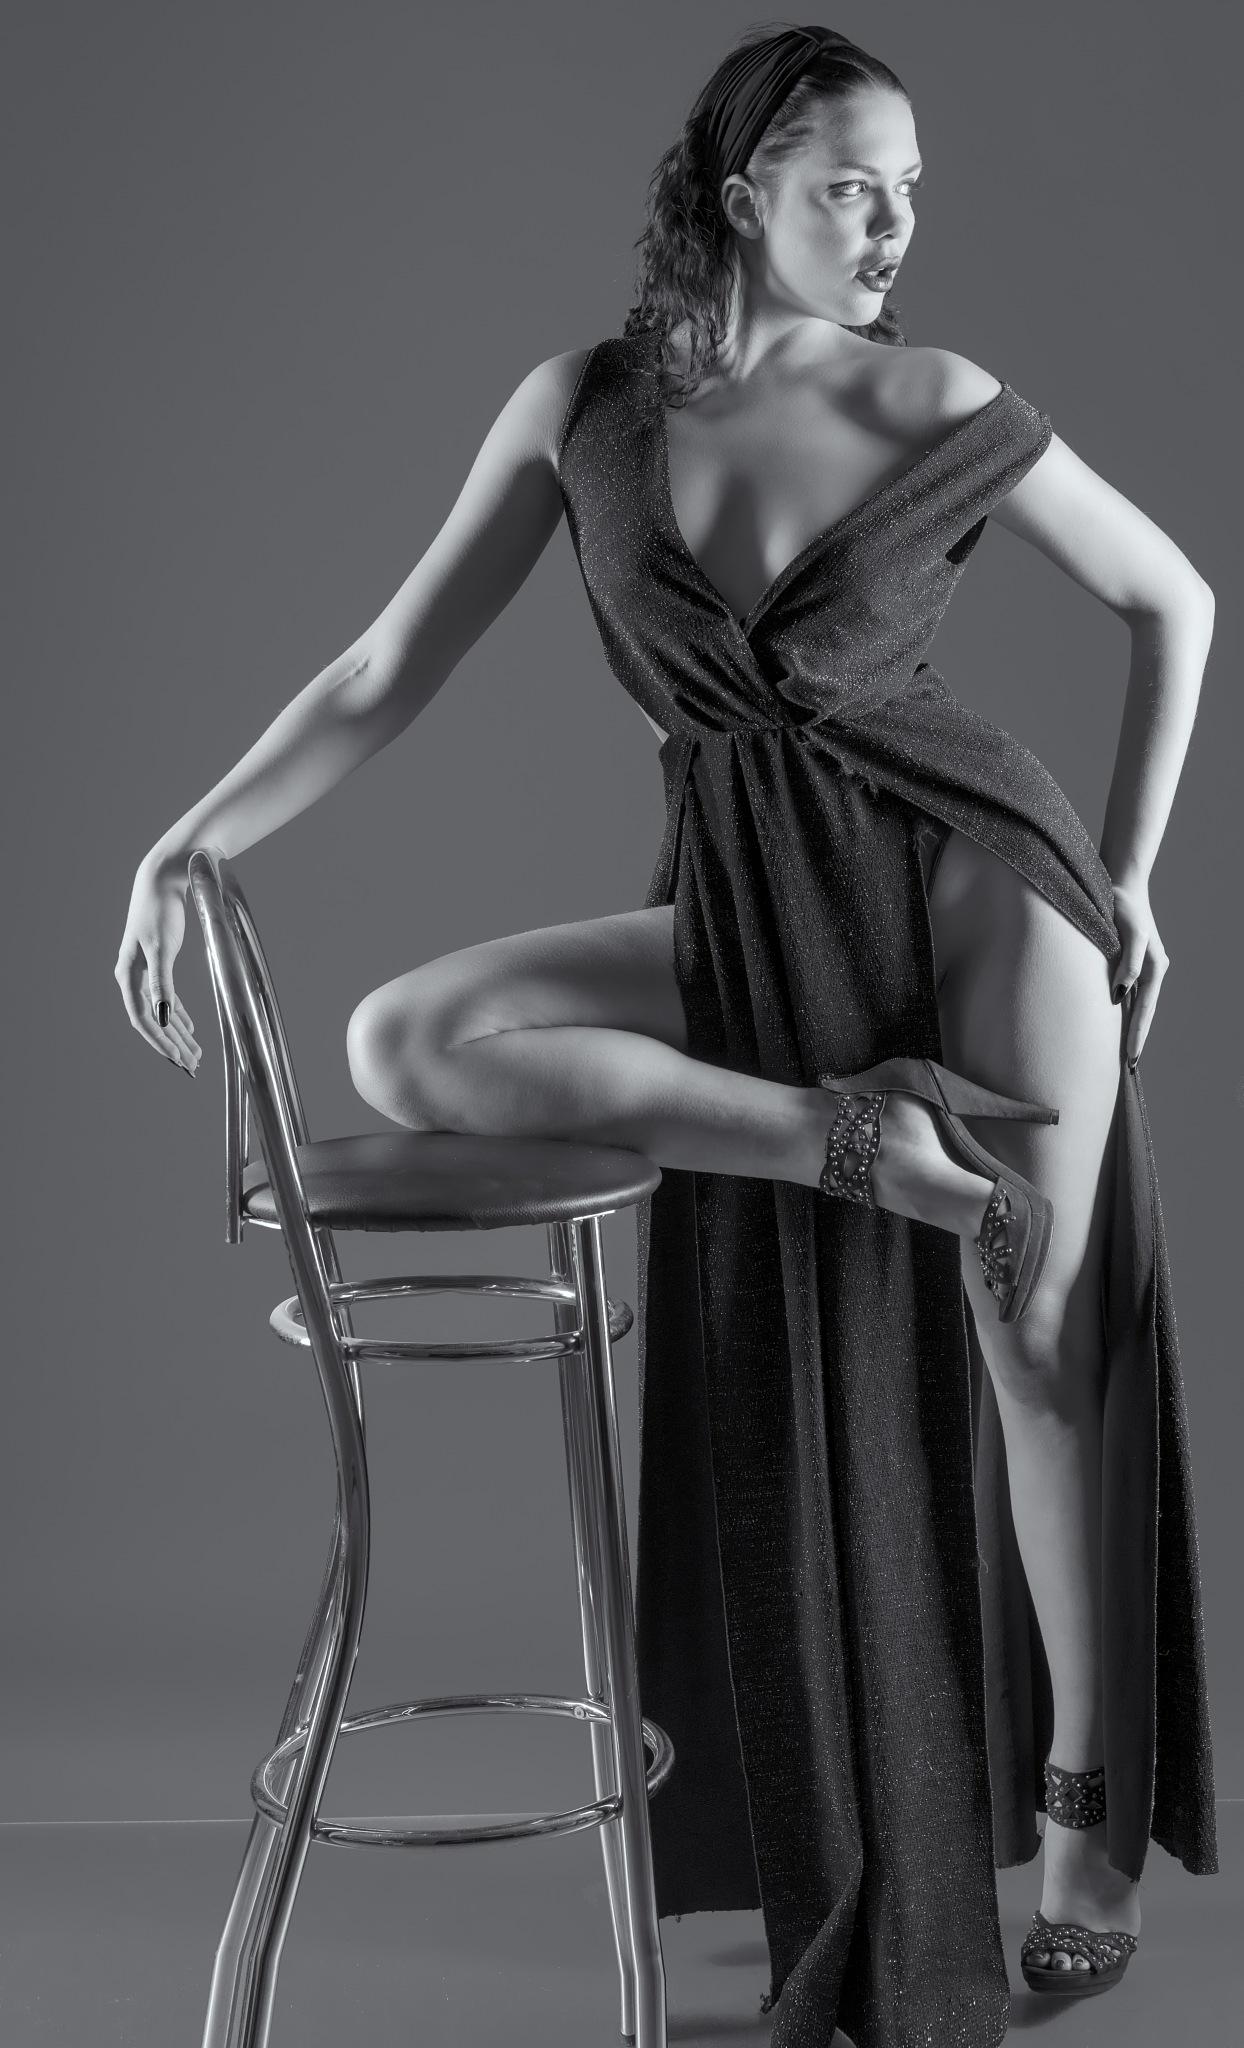 Olga-Maria - Barhocker - Bar stool by Helmut Brandt